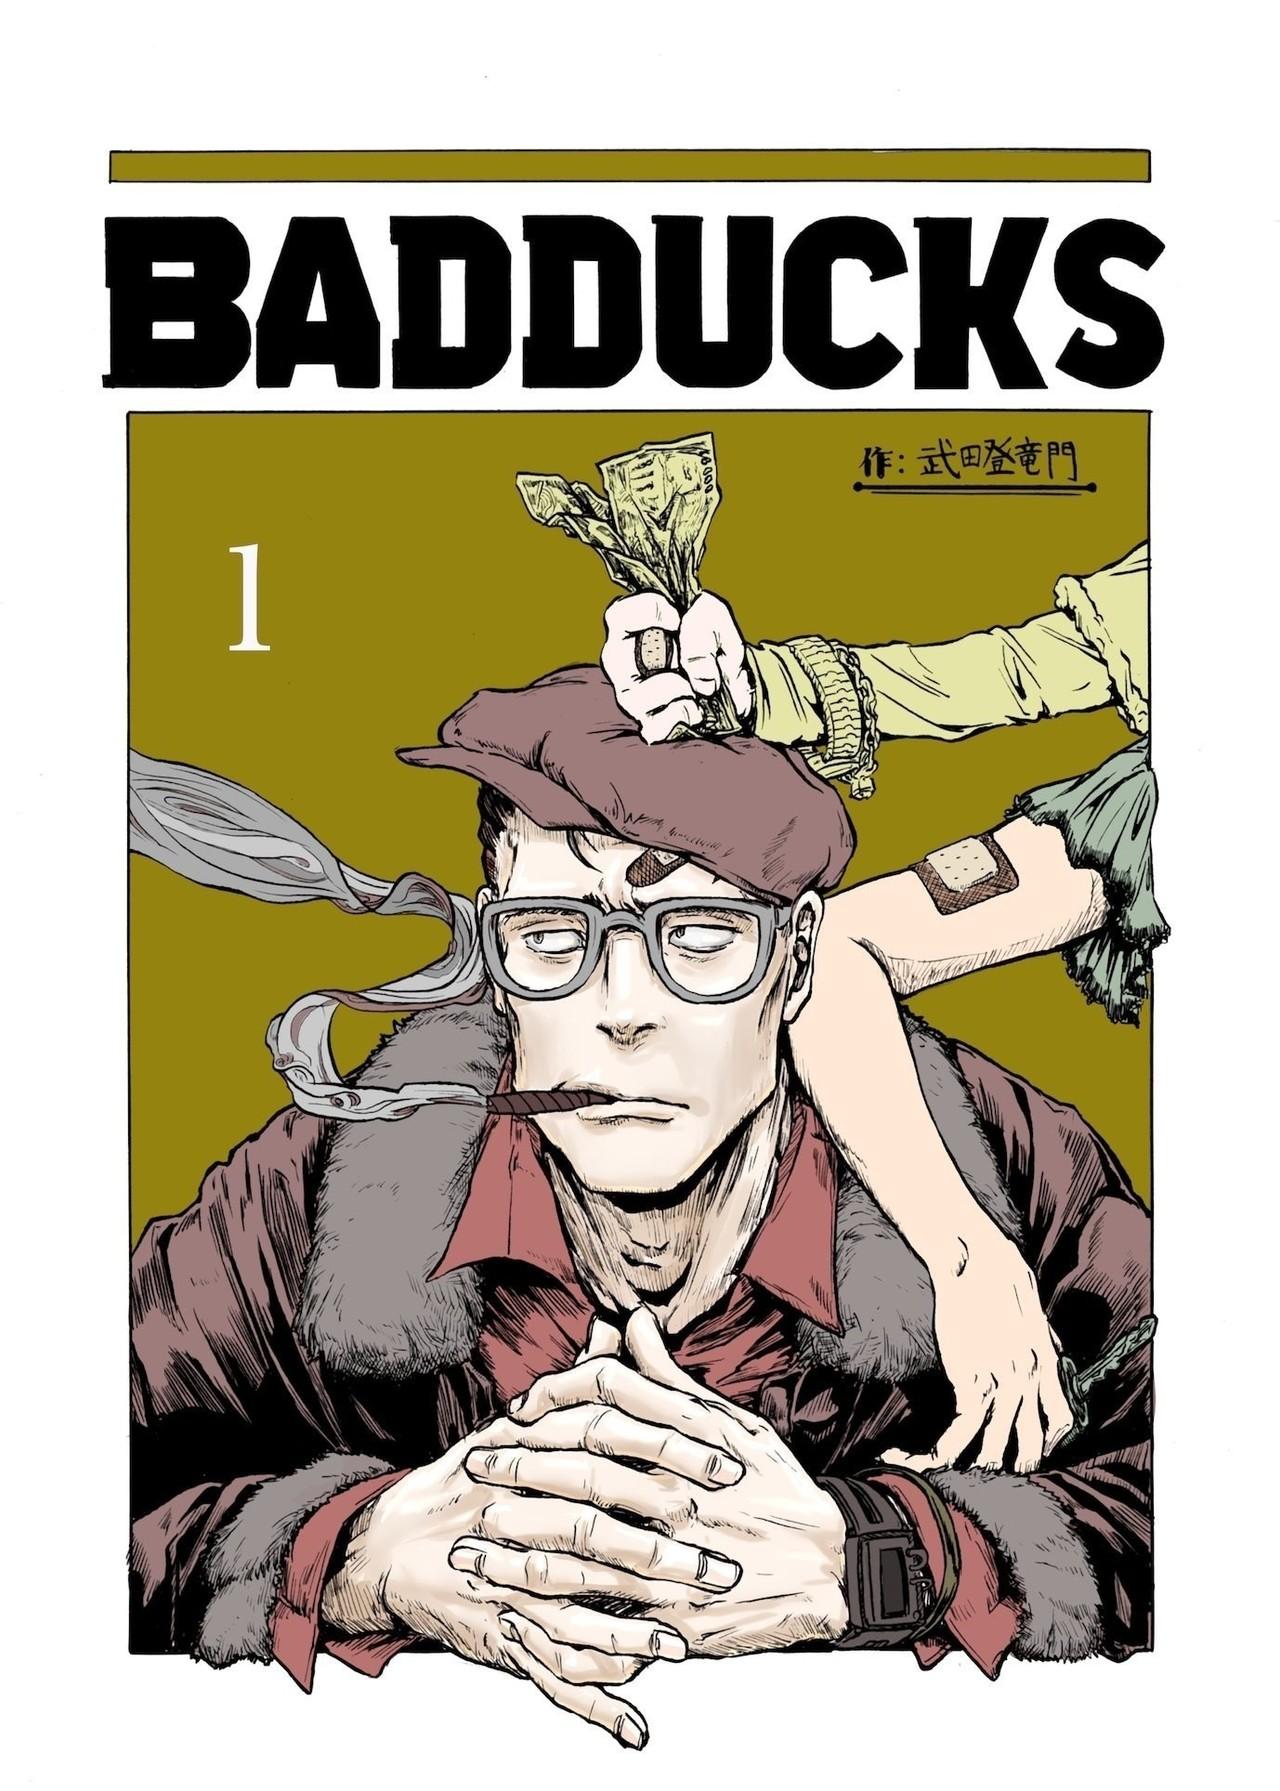 Badducks 第1話武田登竜門note